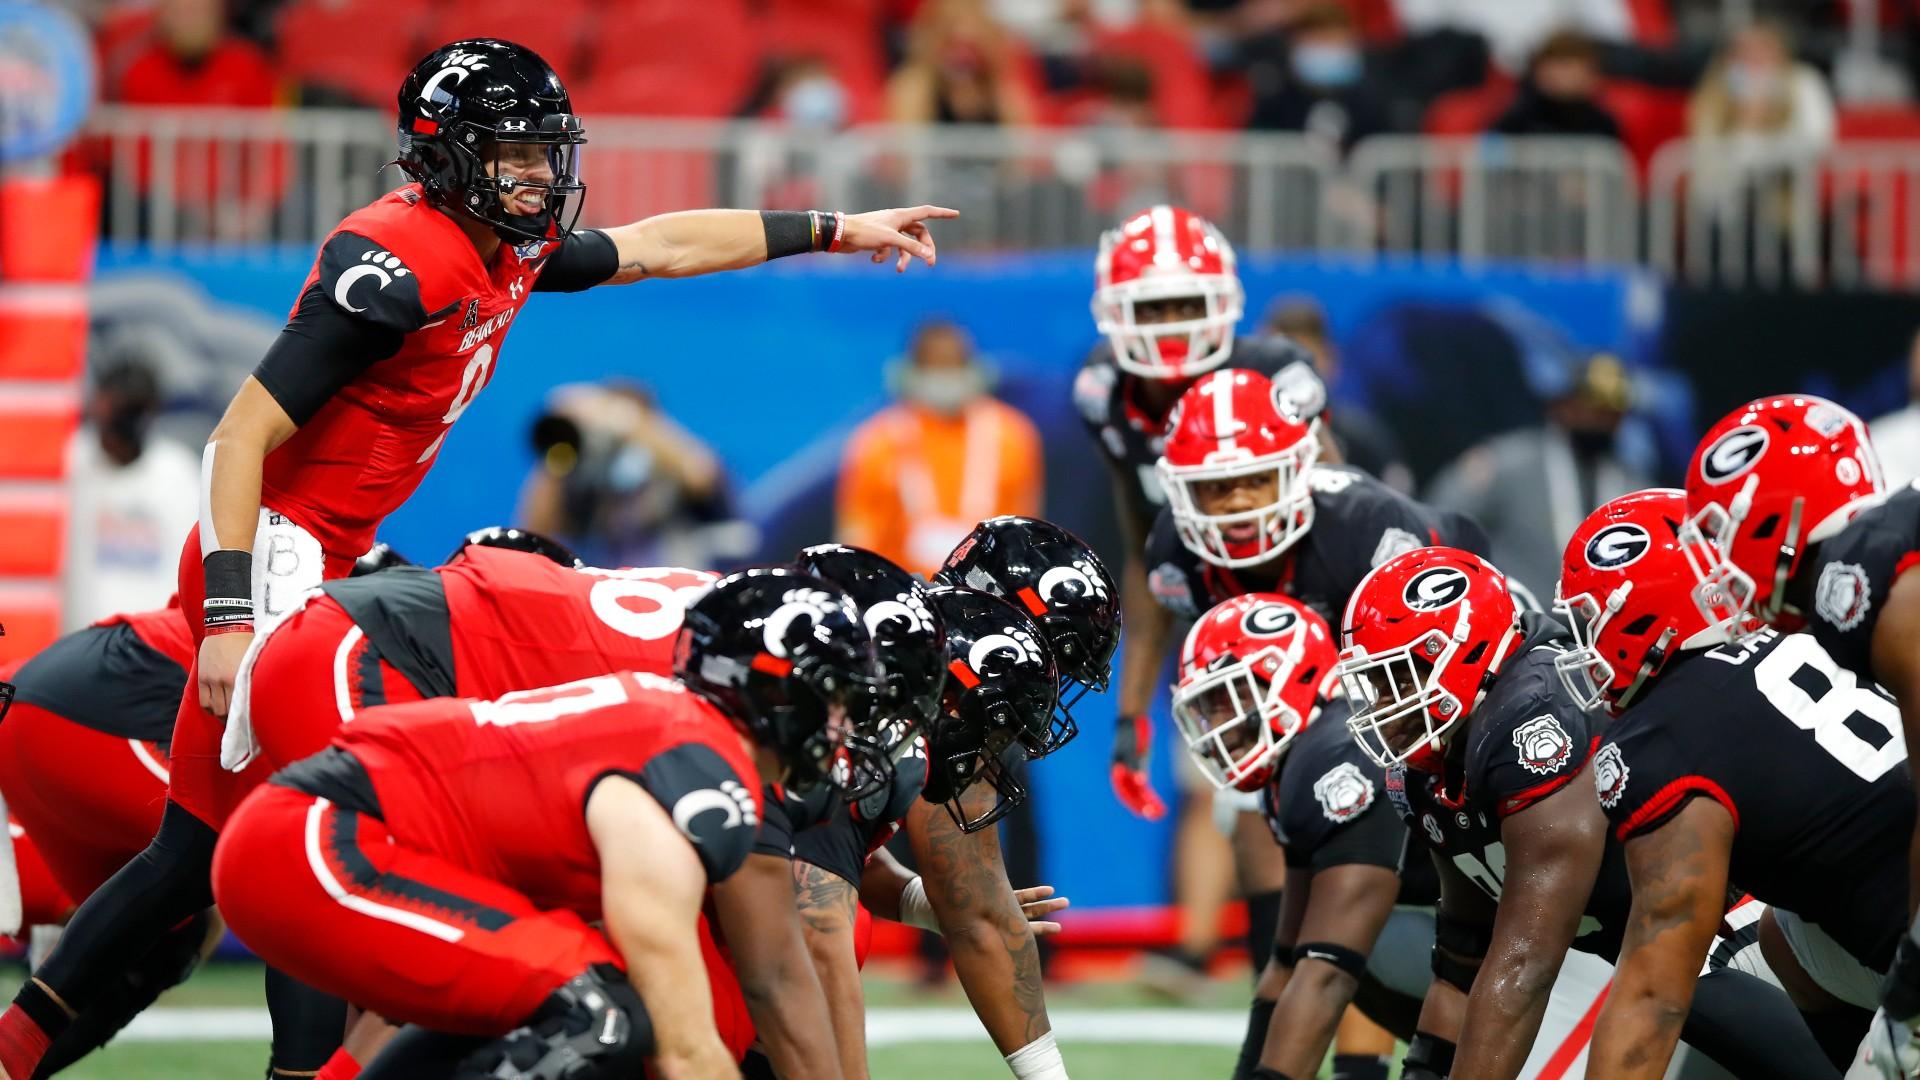 Despite loss to Georgia, Cincinnati validates Group of 5's place in eight-team playoff debate